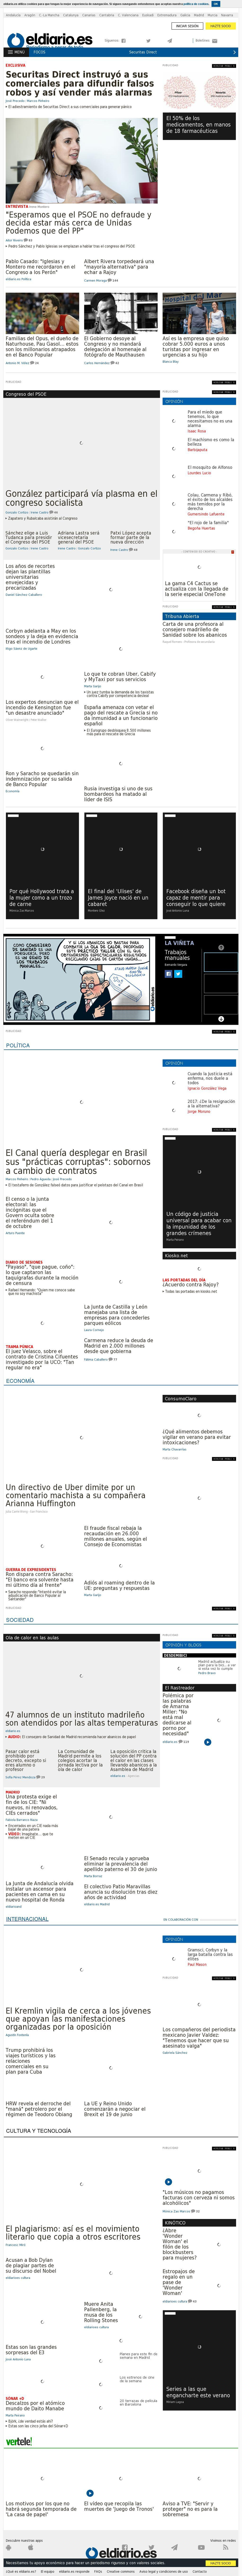 El Diario at Friday June 16, 2017, 9:03 a.m. UTC